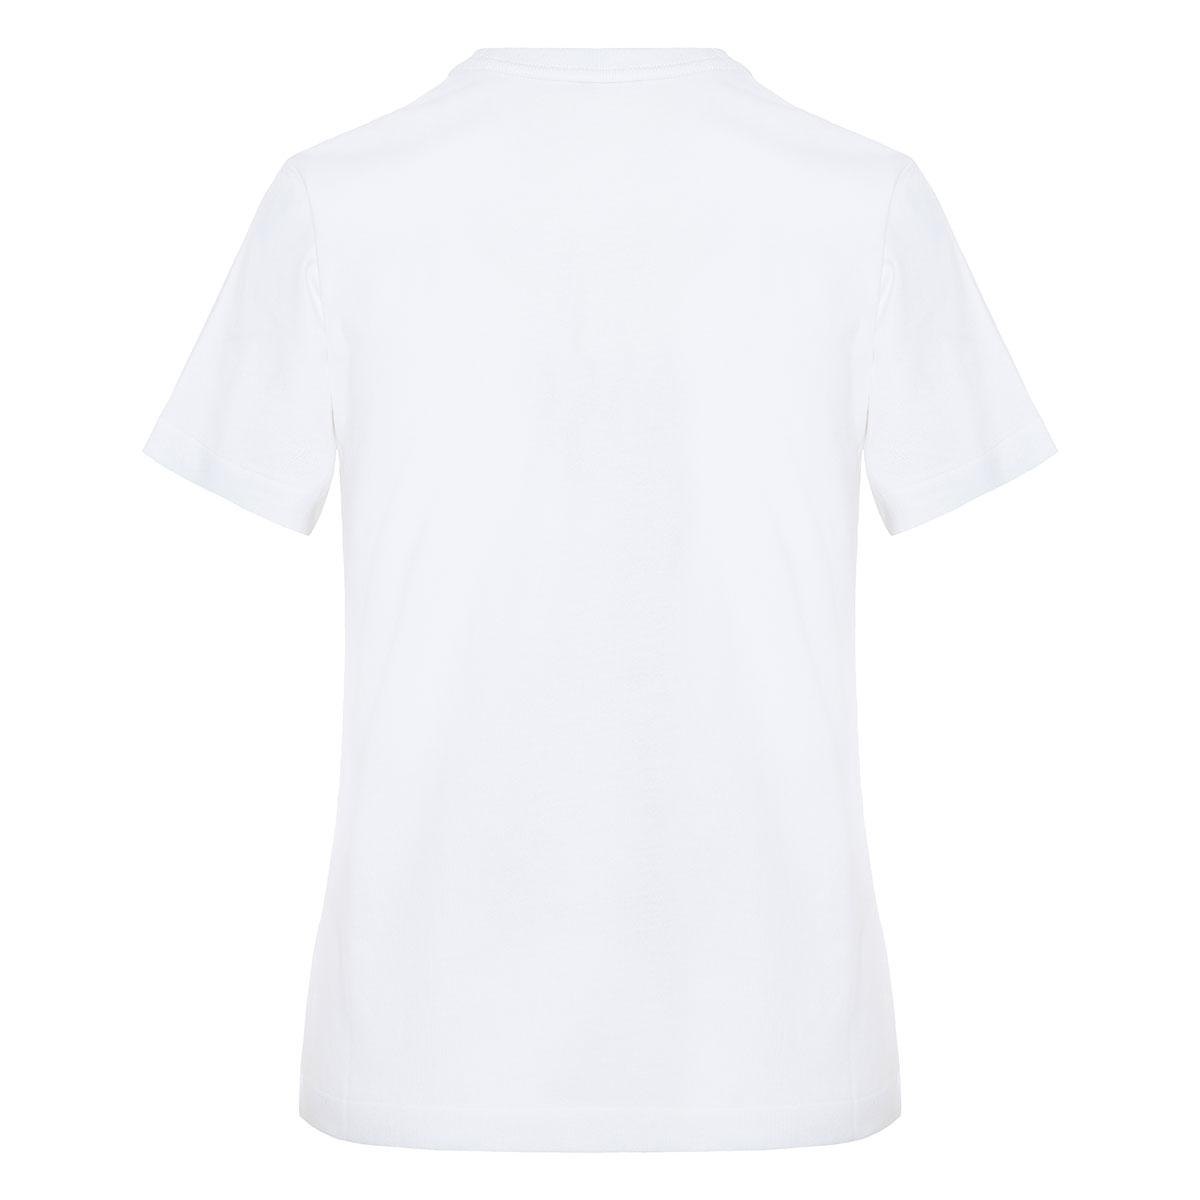 Edition 2004 The Alaïa jersey t-shirt